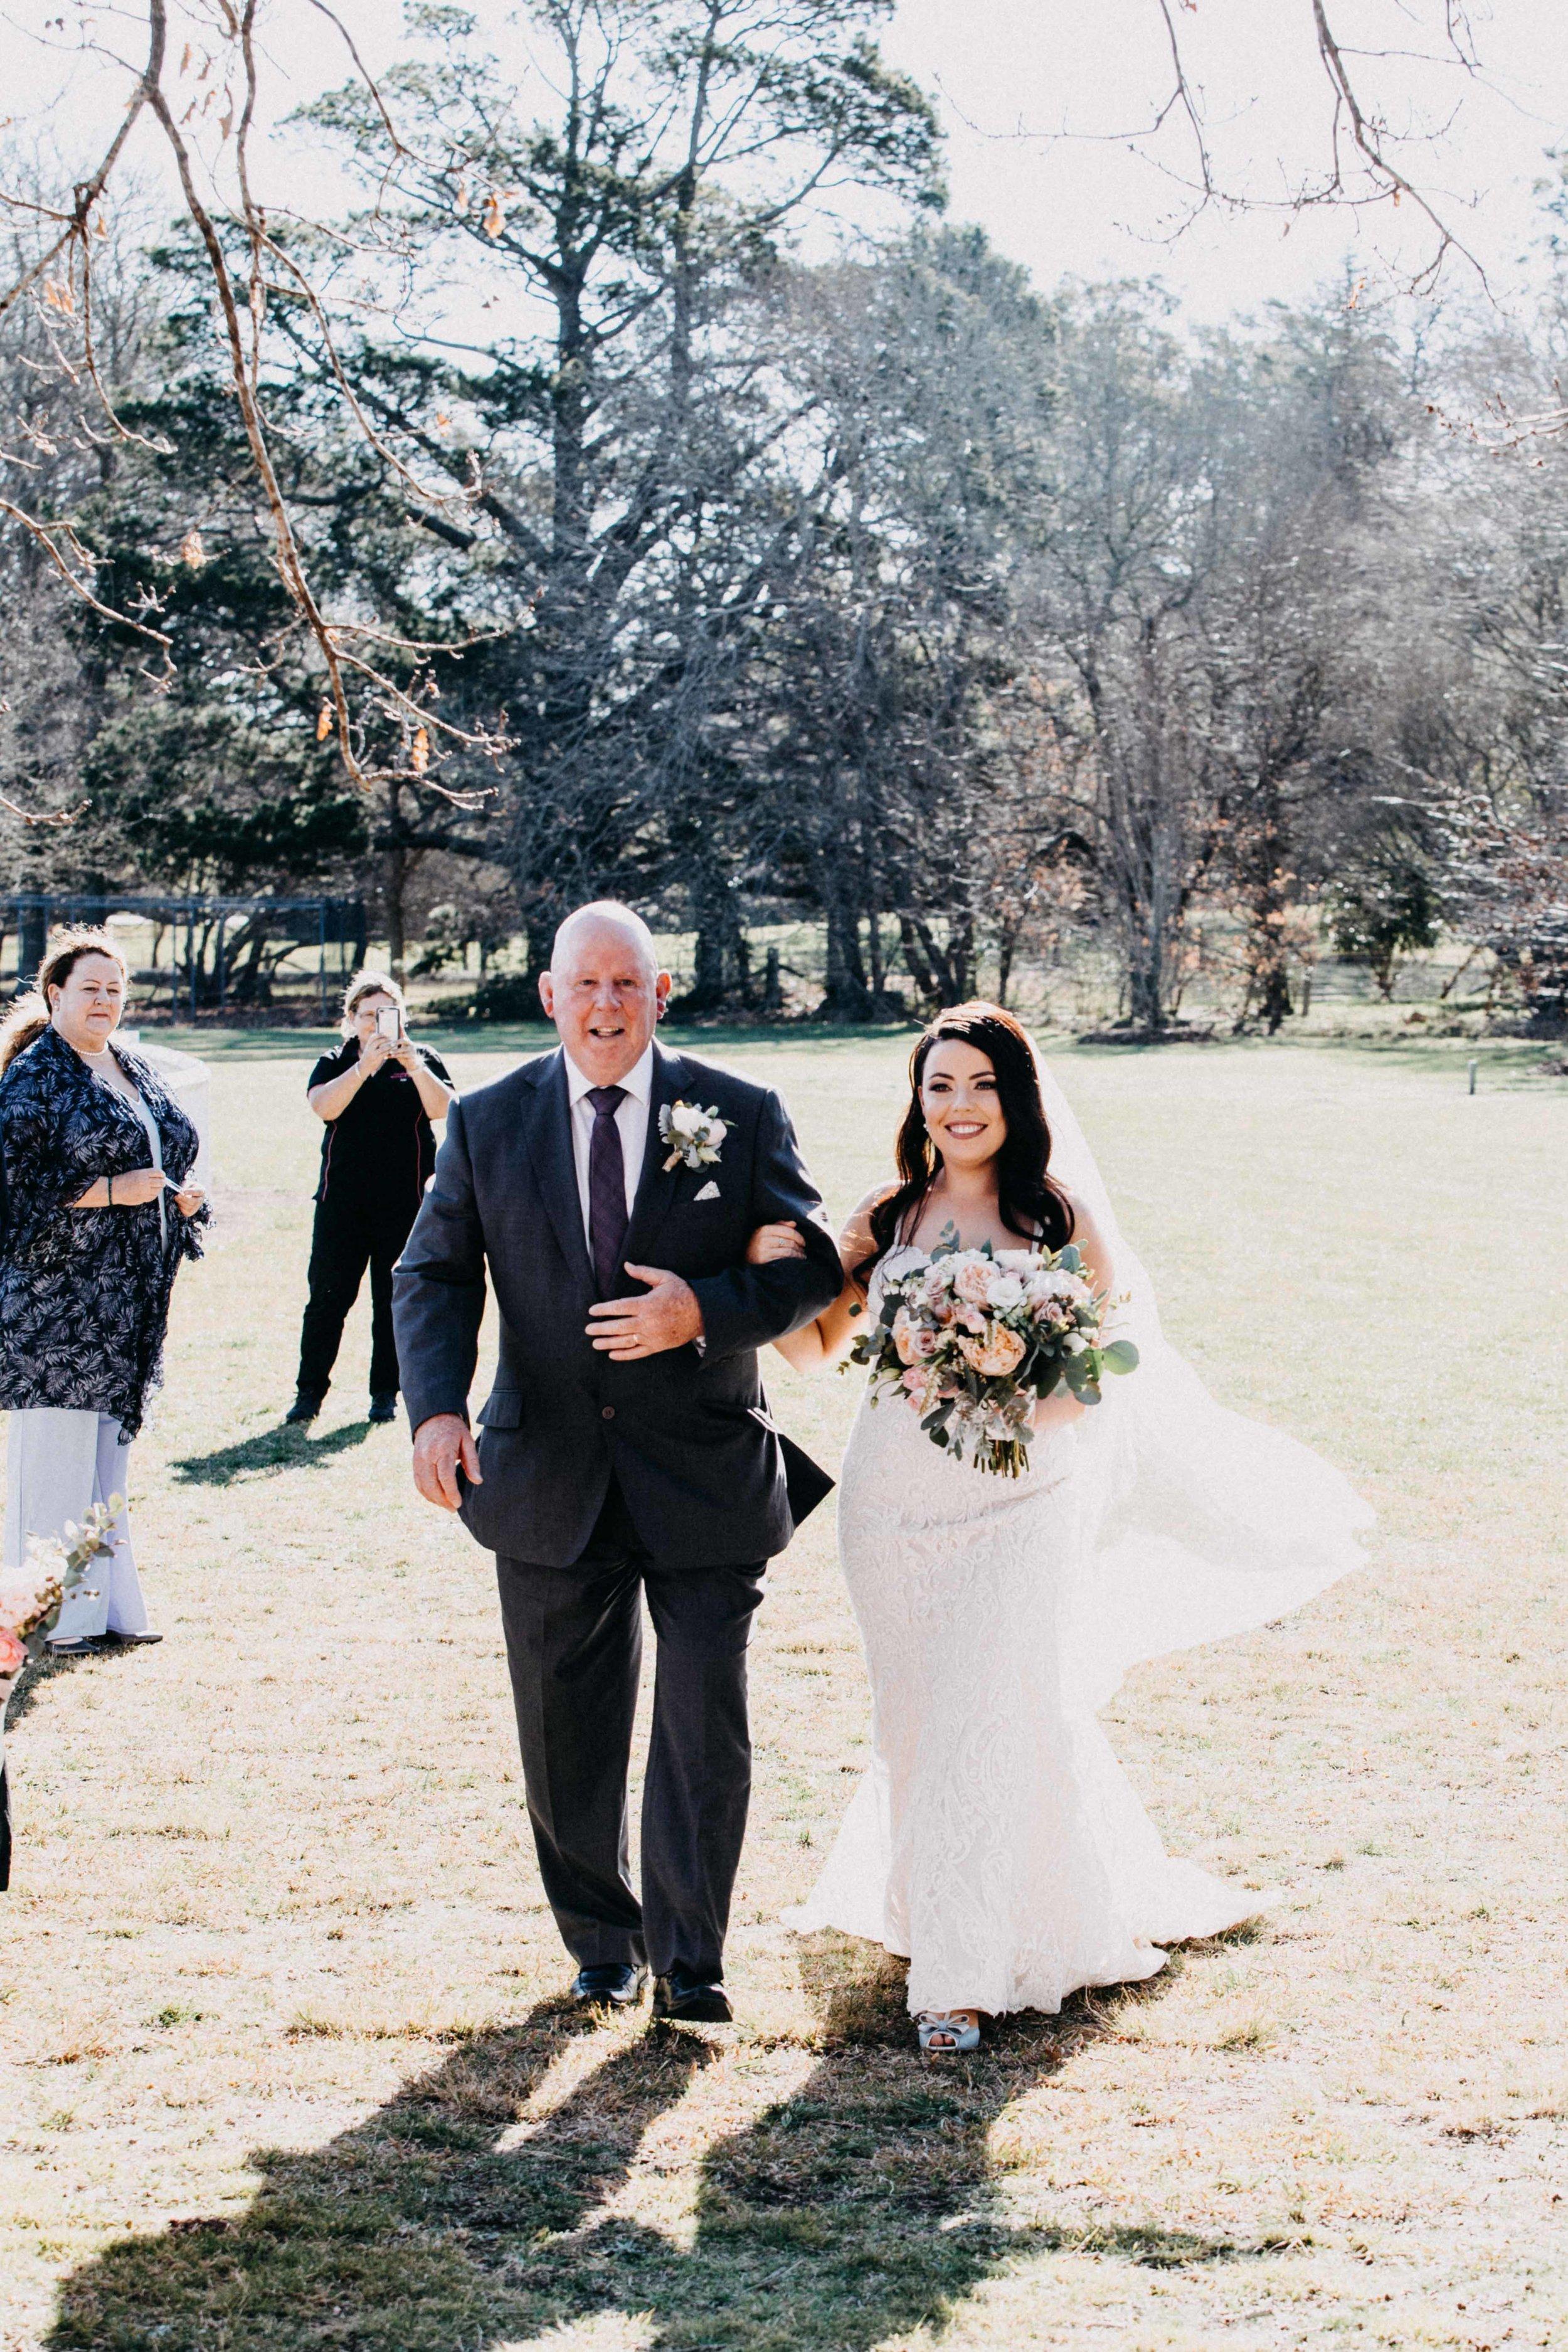 exeter-southern-highlands-wedding-www.emilyobrienphotography.net -63.jpg